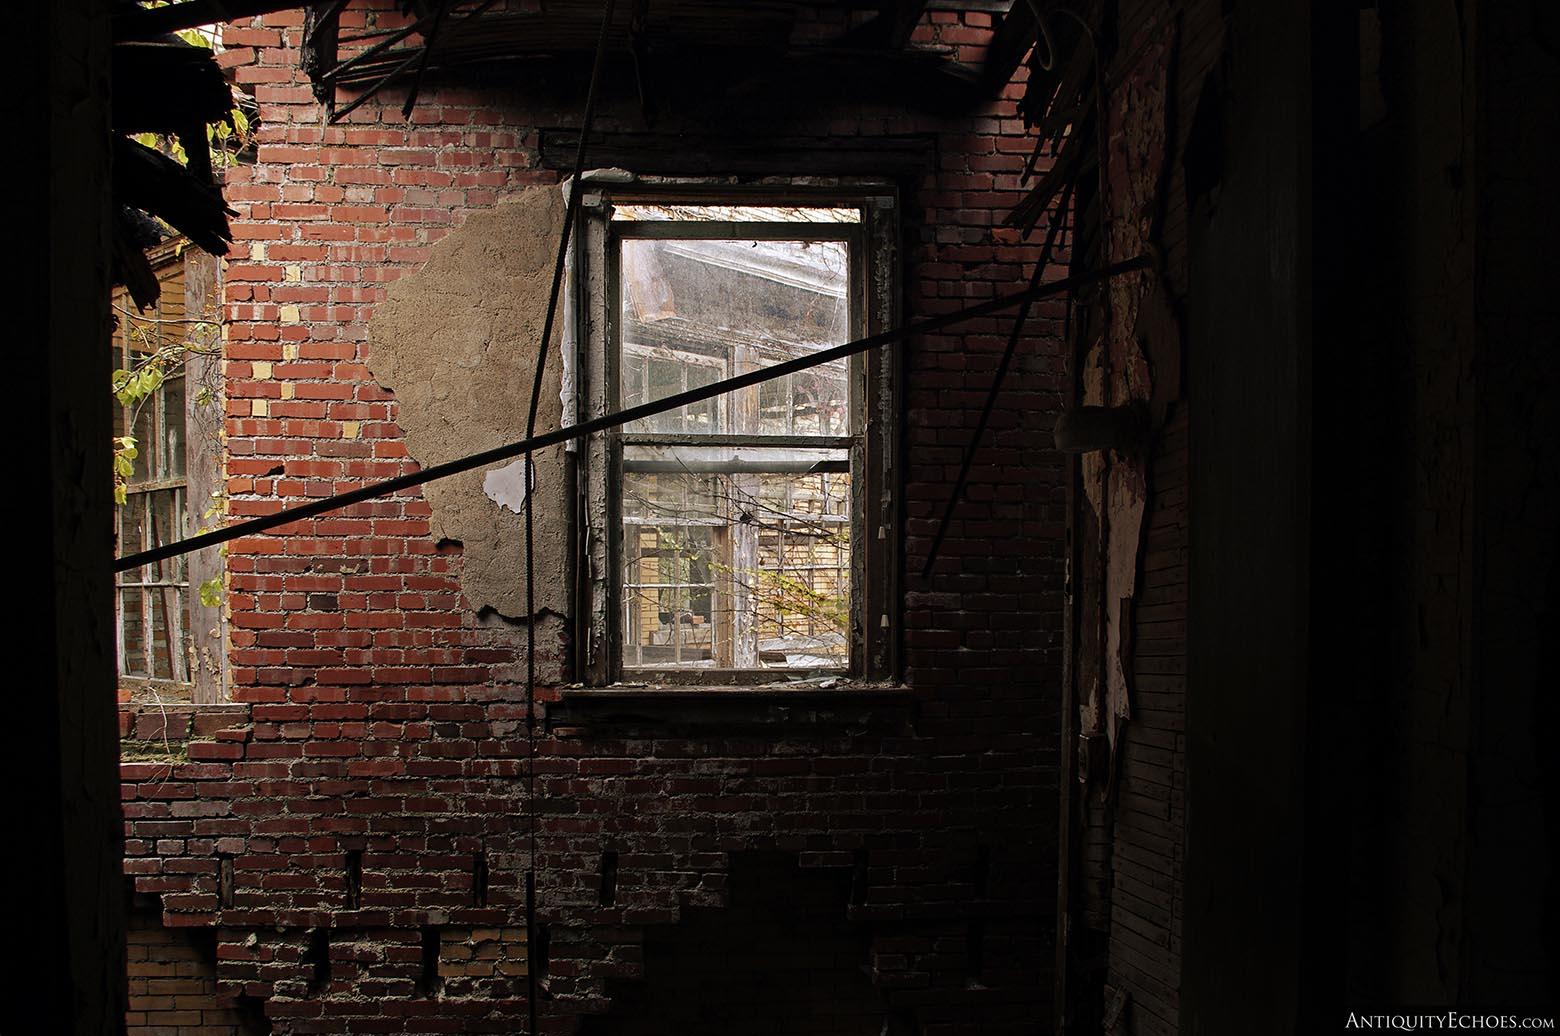 Brownsville General Hospital - Exposed Brick